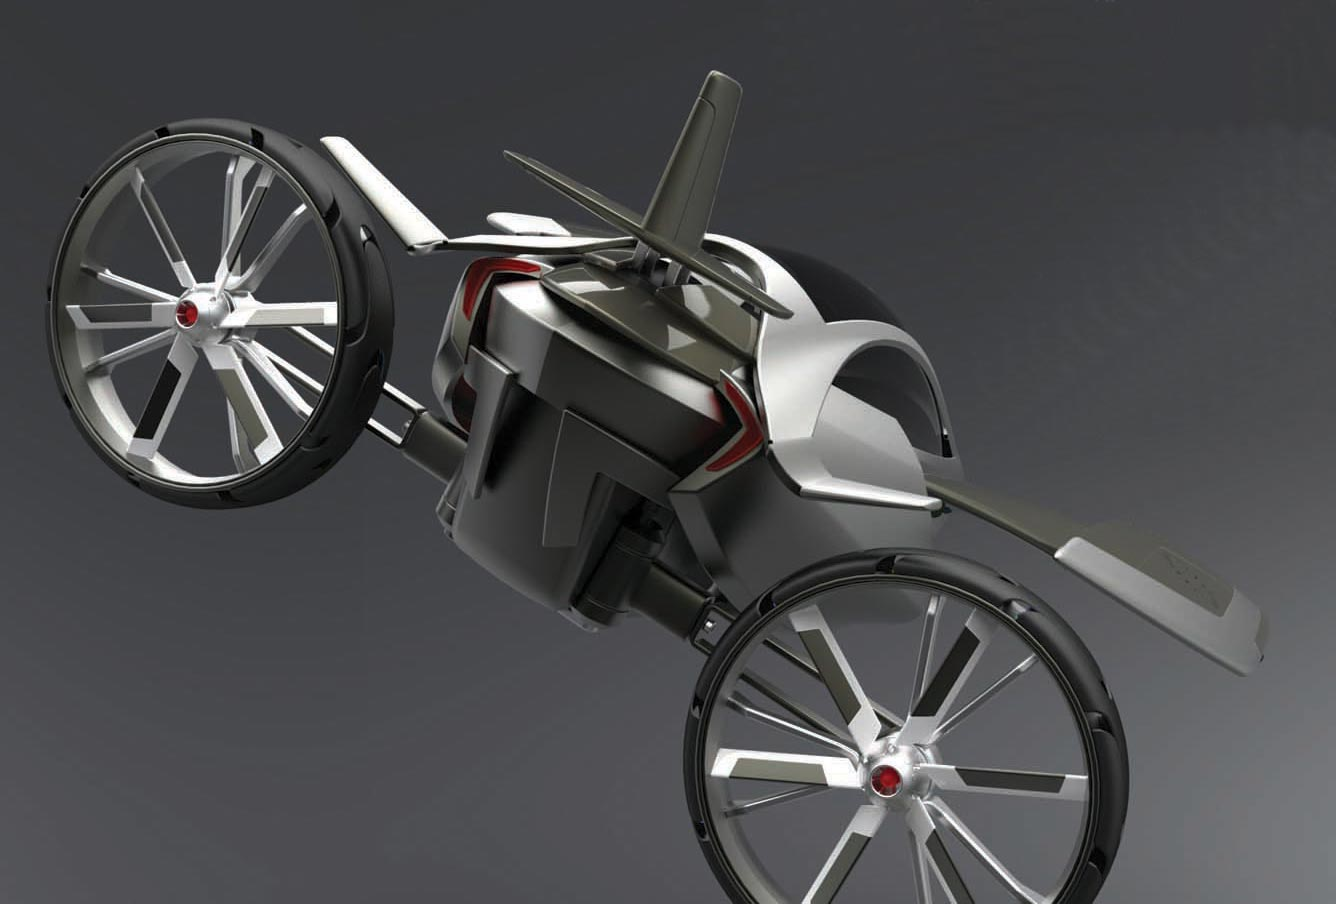 YEE - Concept Flying Car